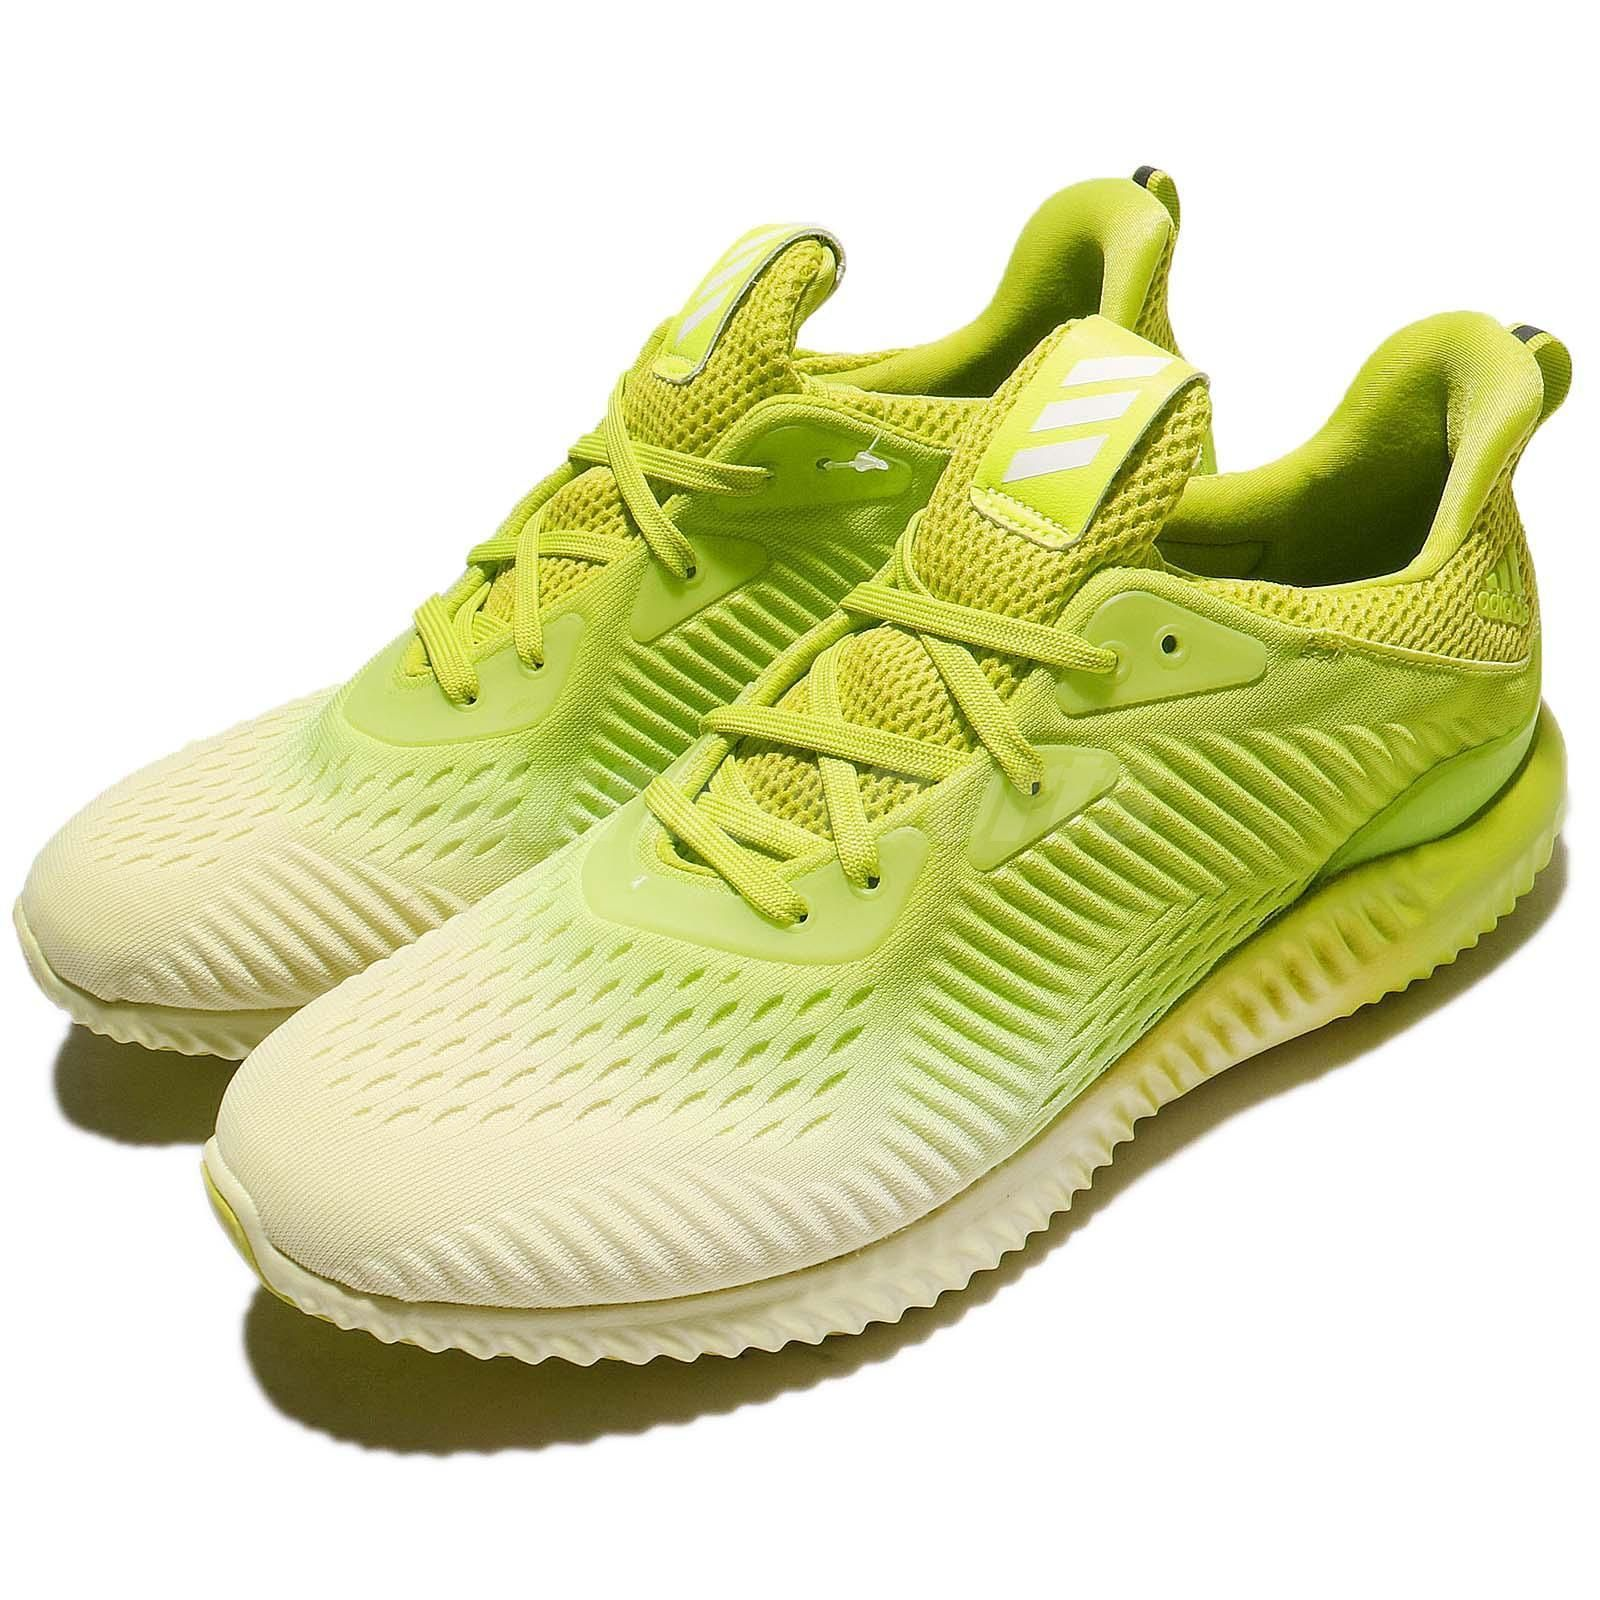 Adidas Alphabounce Em M Ice Yellow Volt Men Running Shoes Sneaker